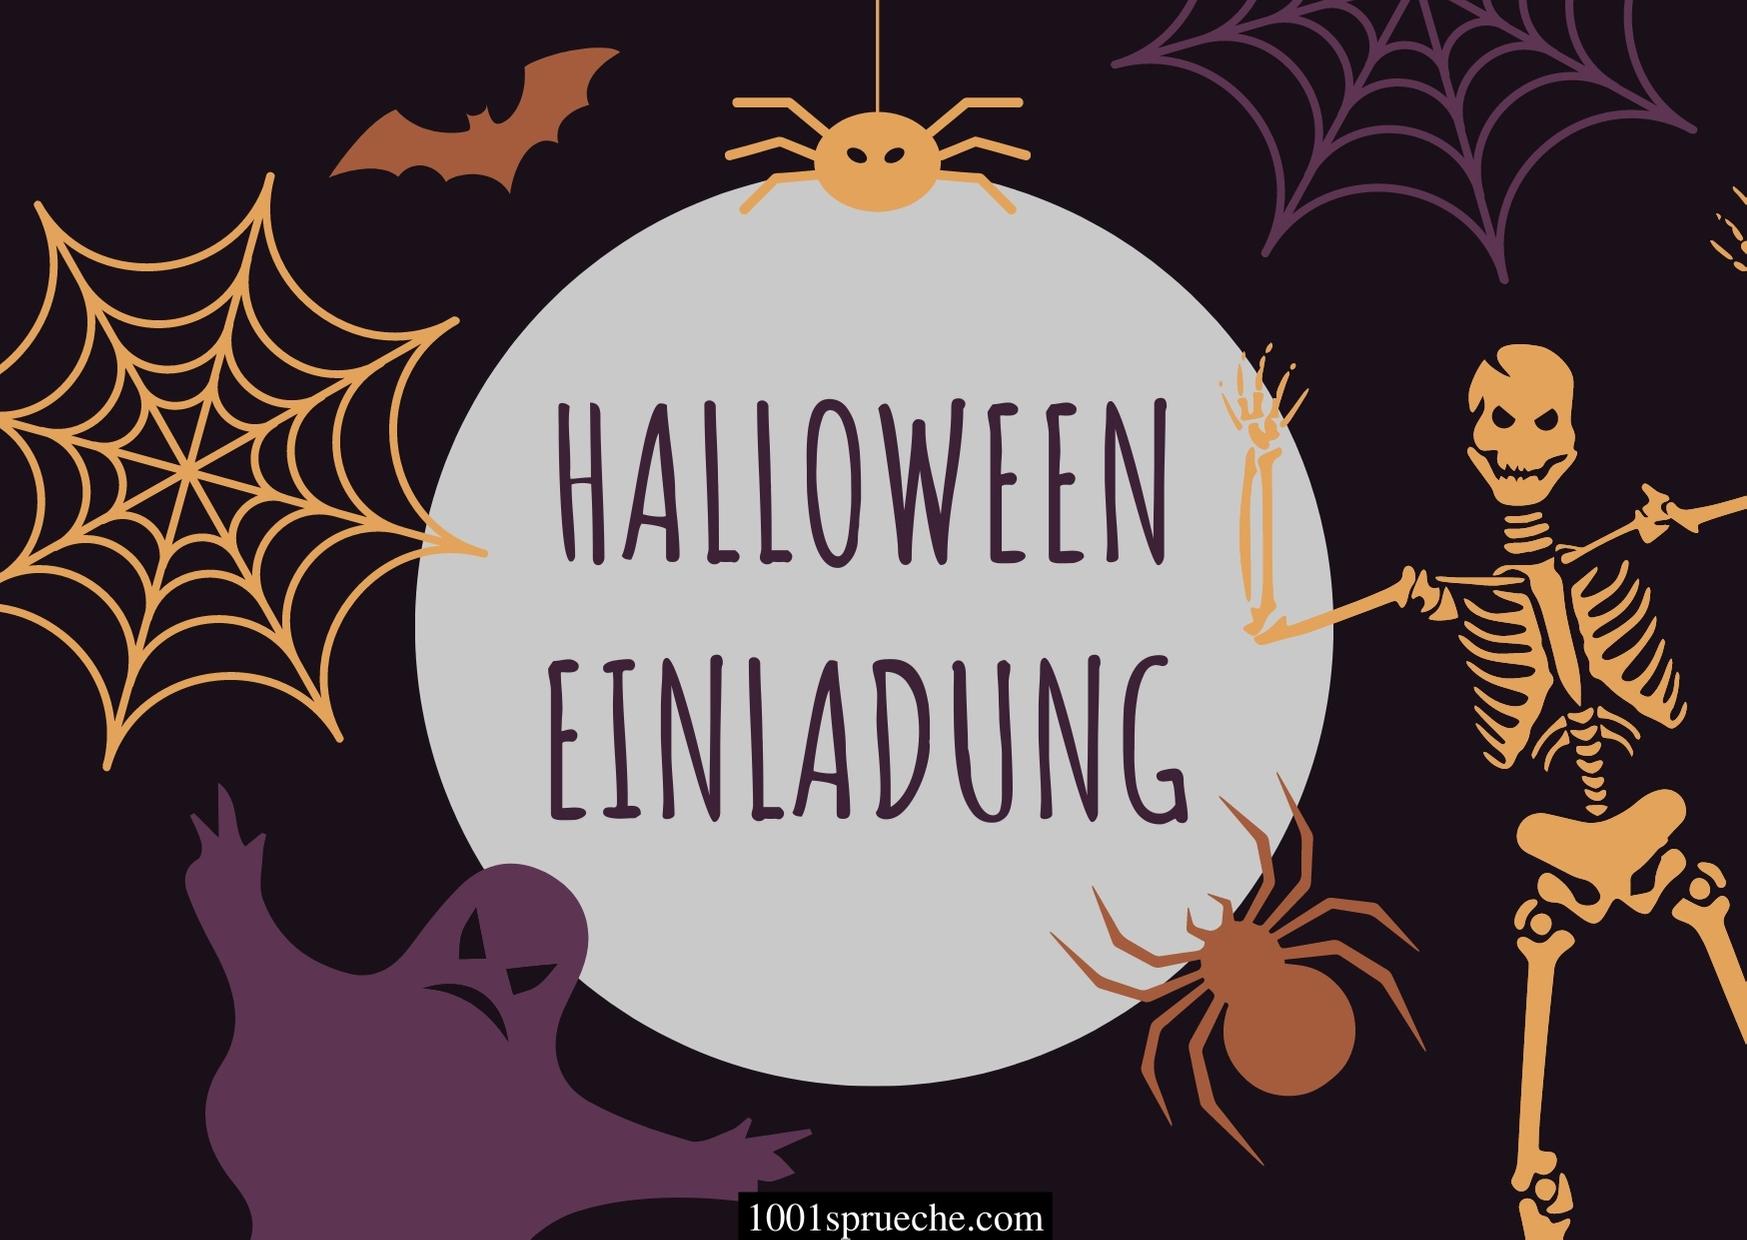 Halloween Einladung Text